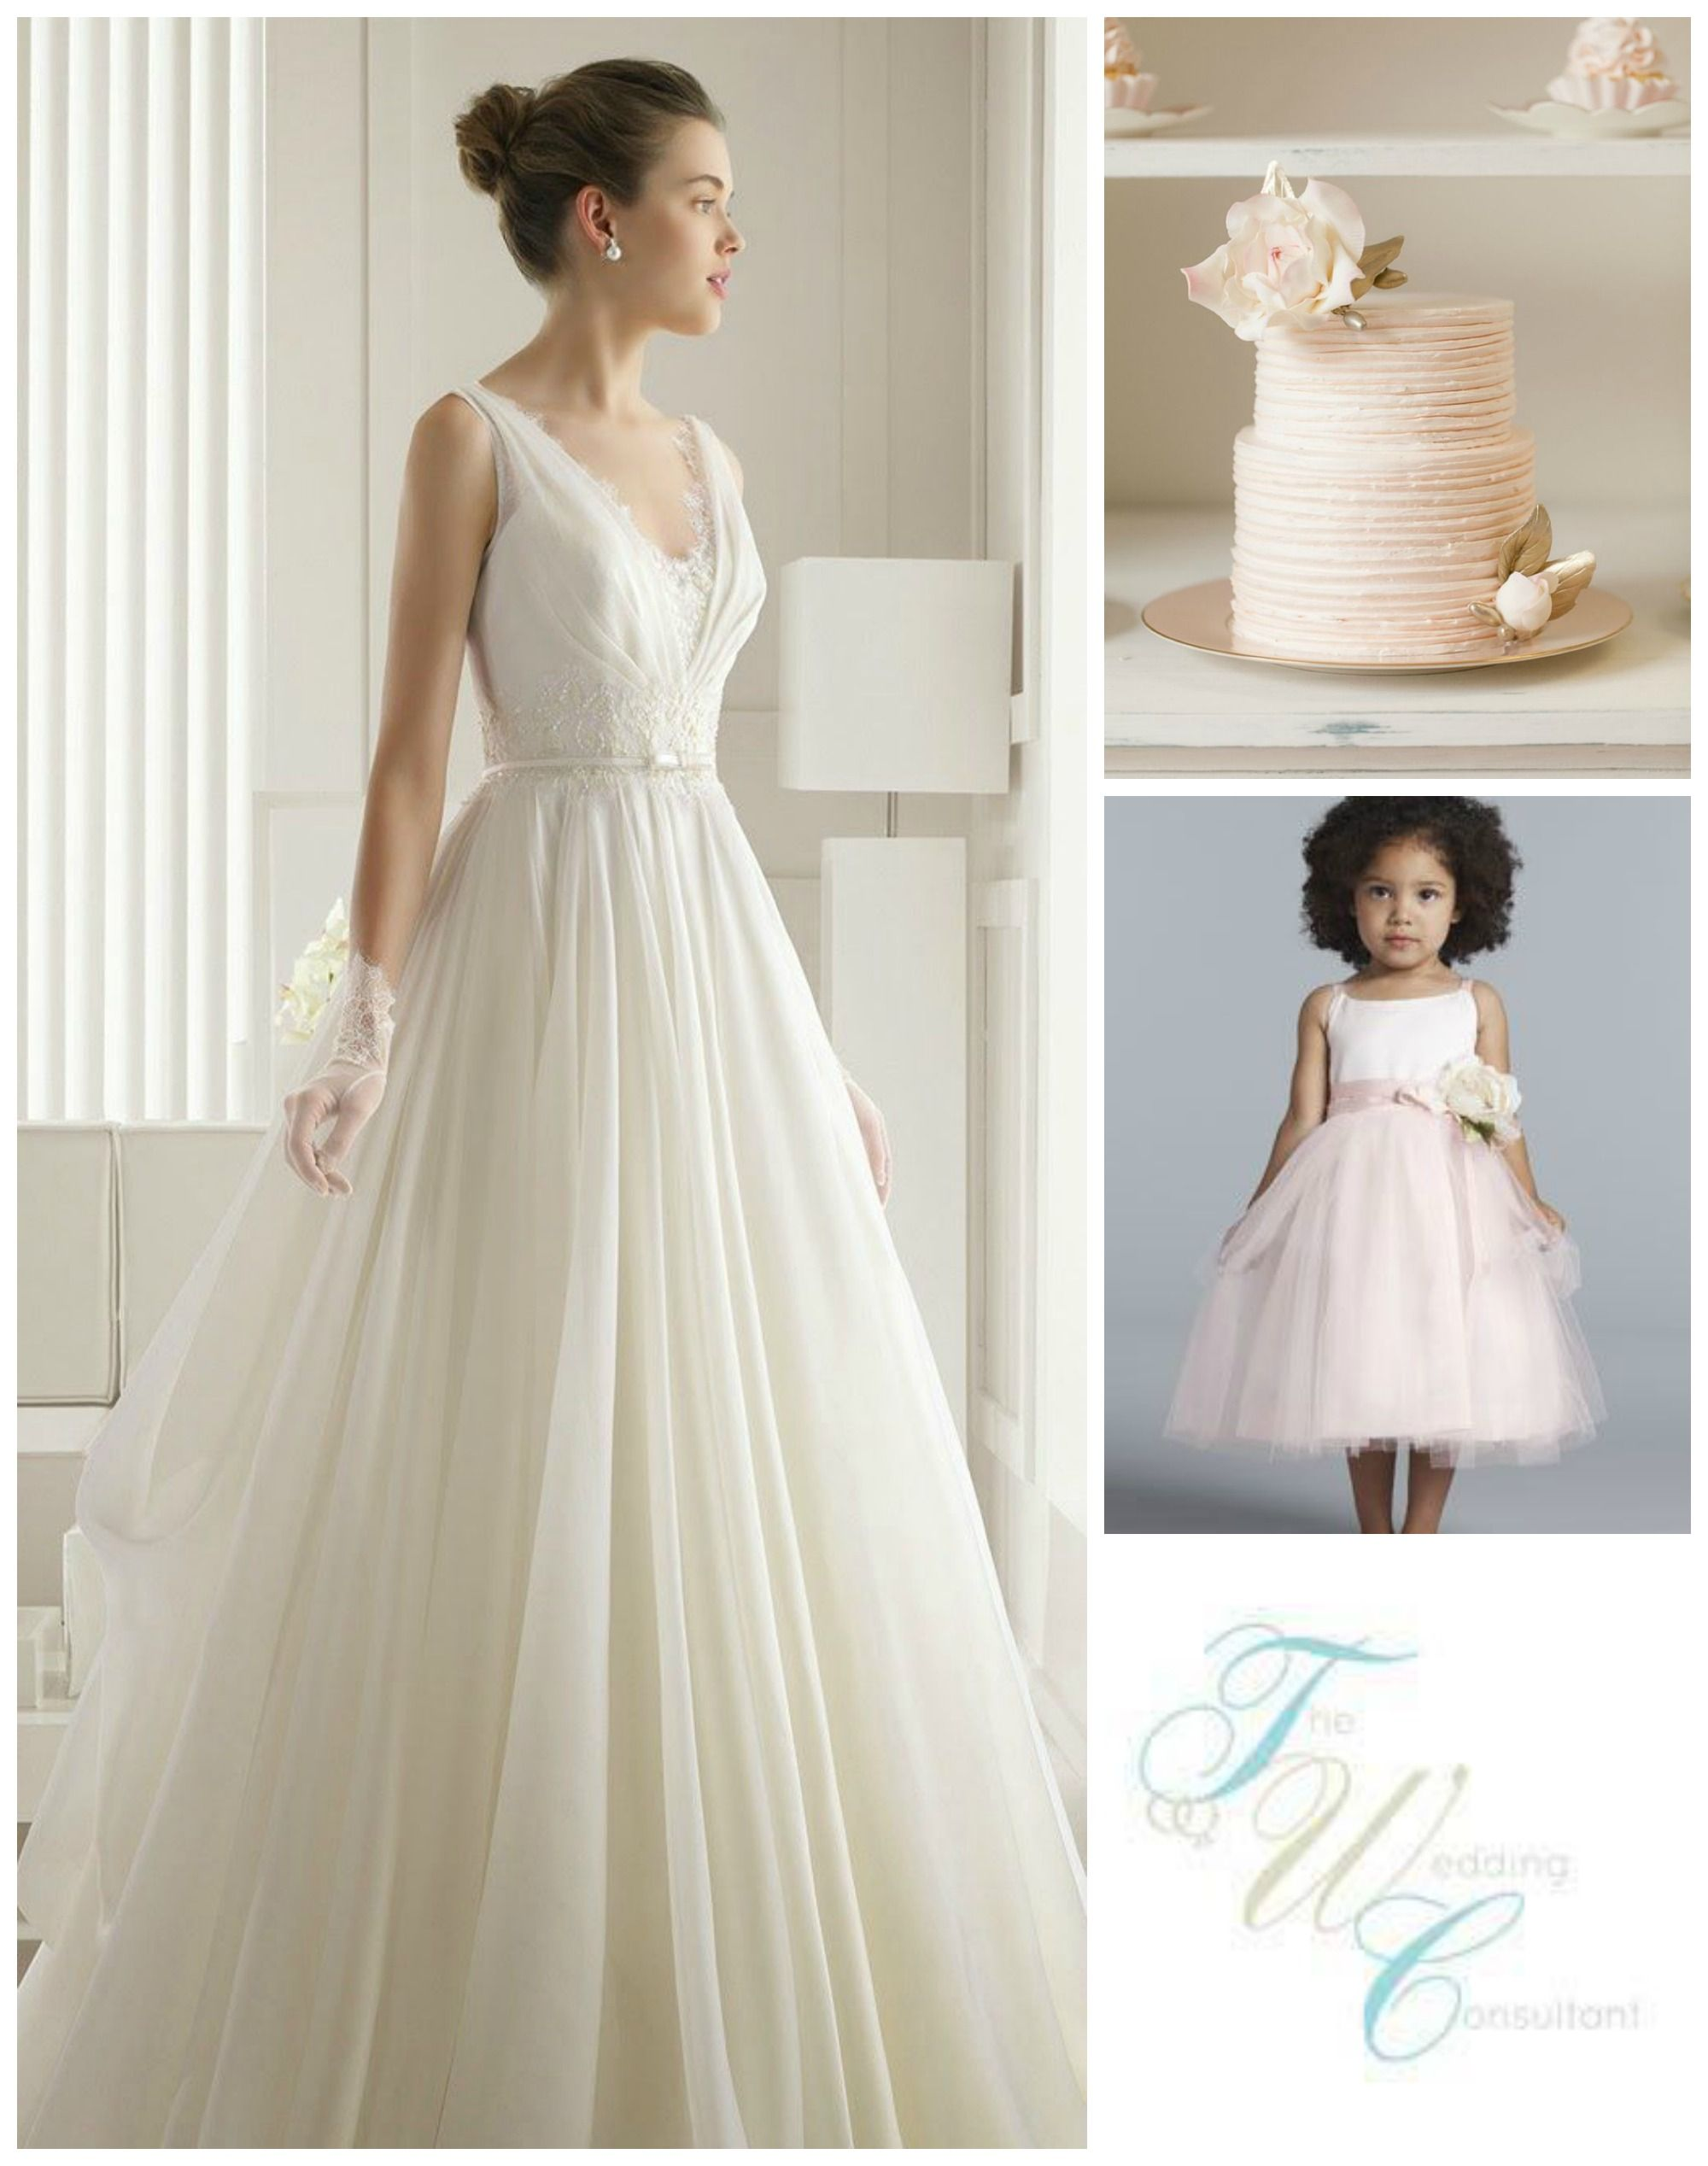 2015 wedding trends - Strawberry Pink.#2015 wedding trends # weddings #The Wedding Consultant